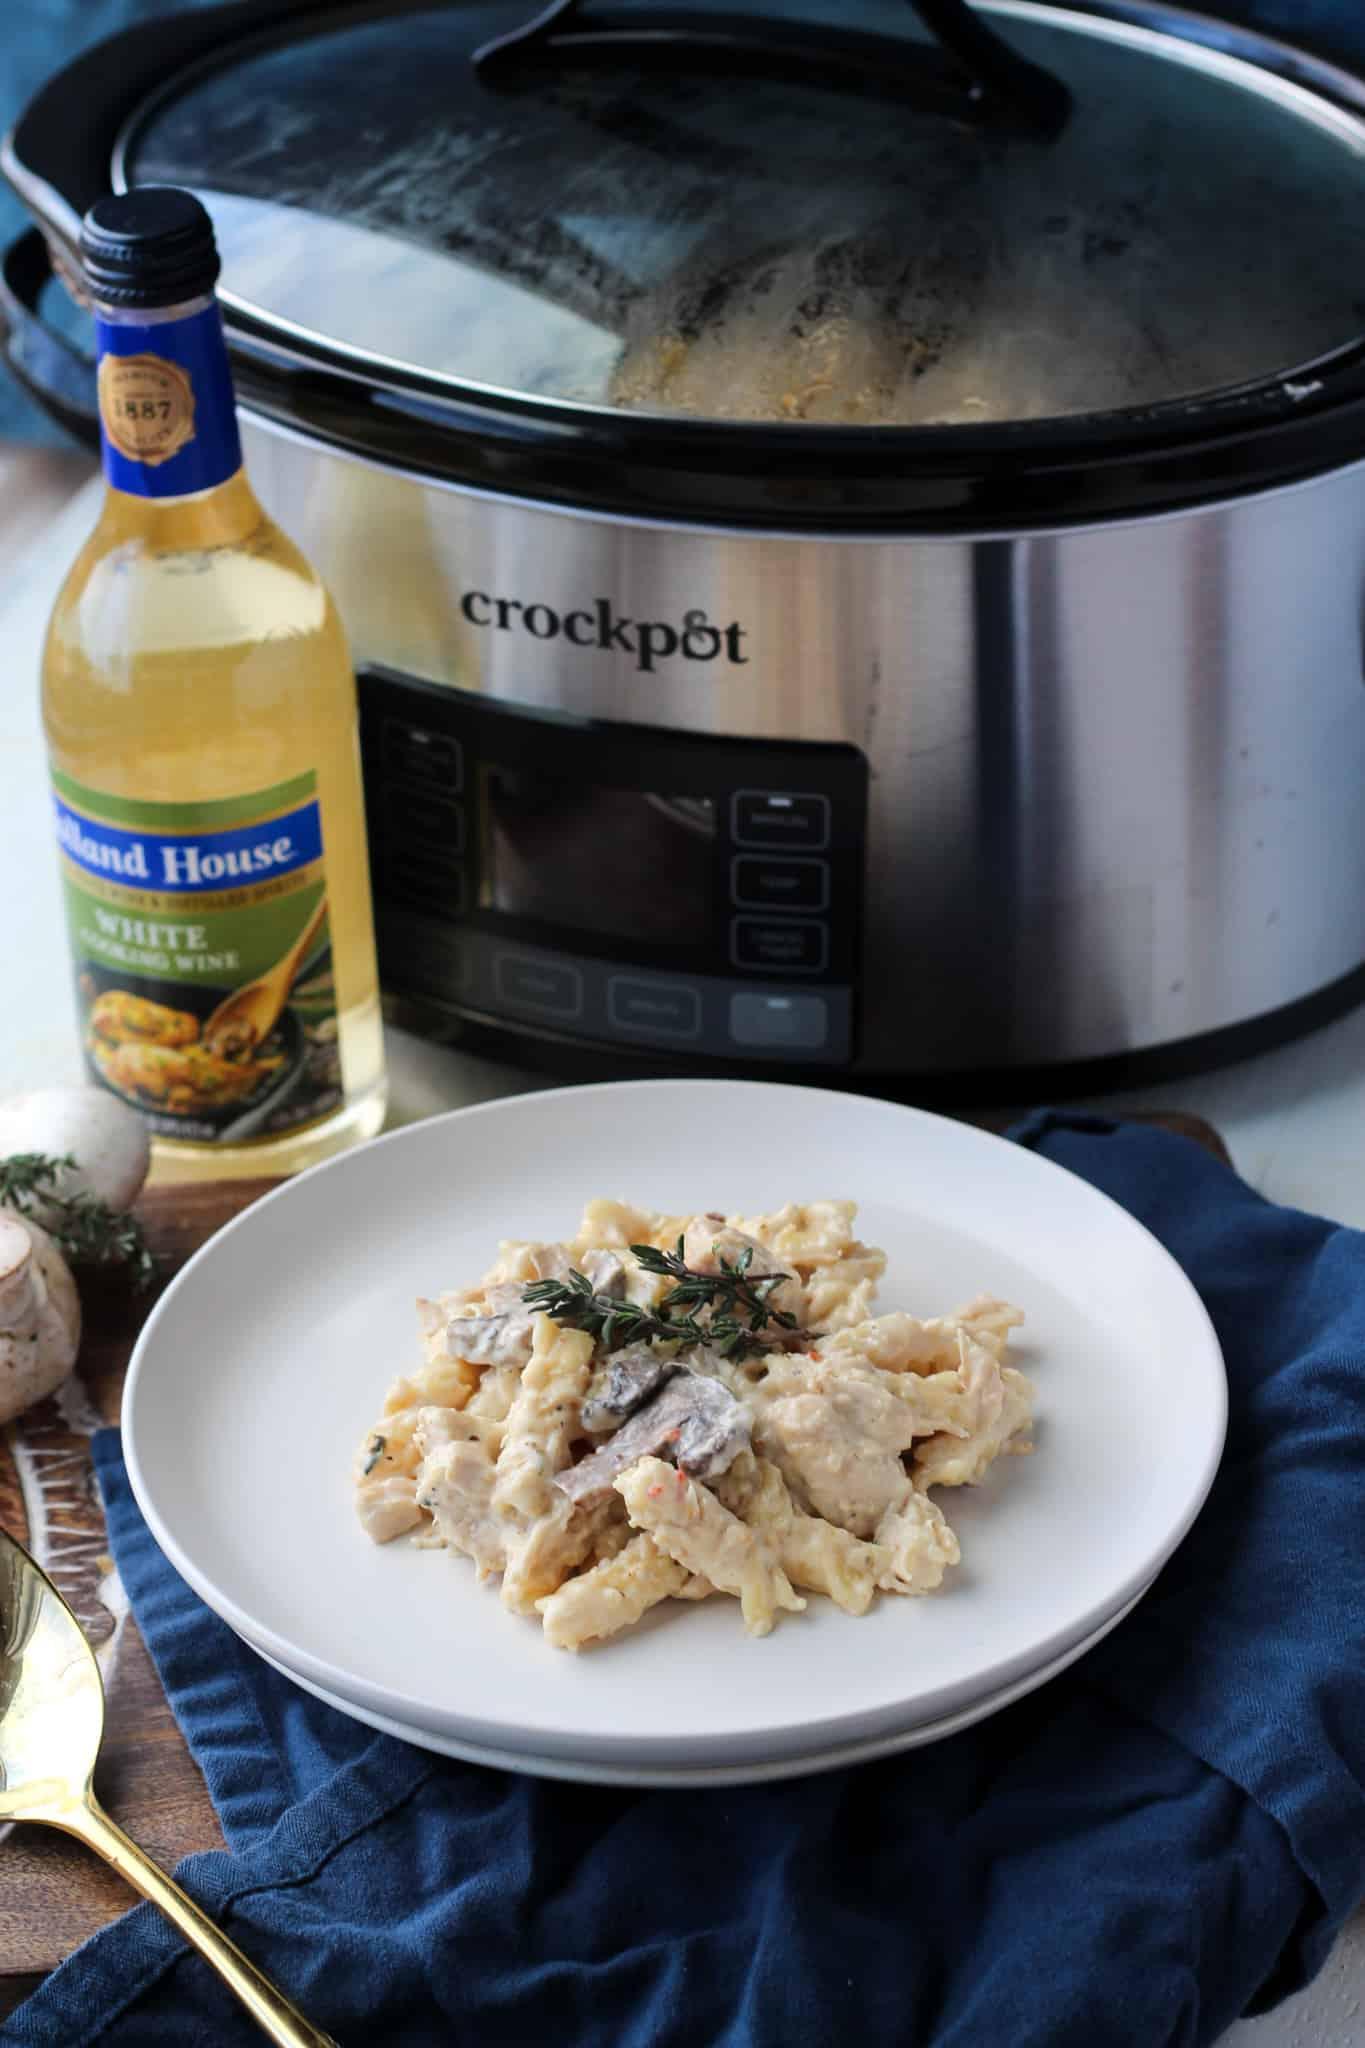 Creamy Crock-Pot Italian Chicken Pasta